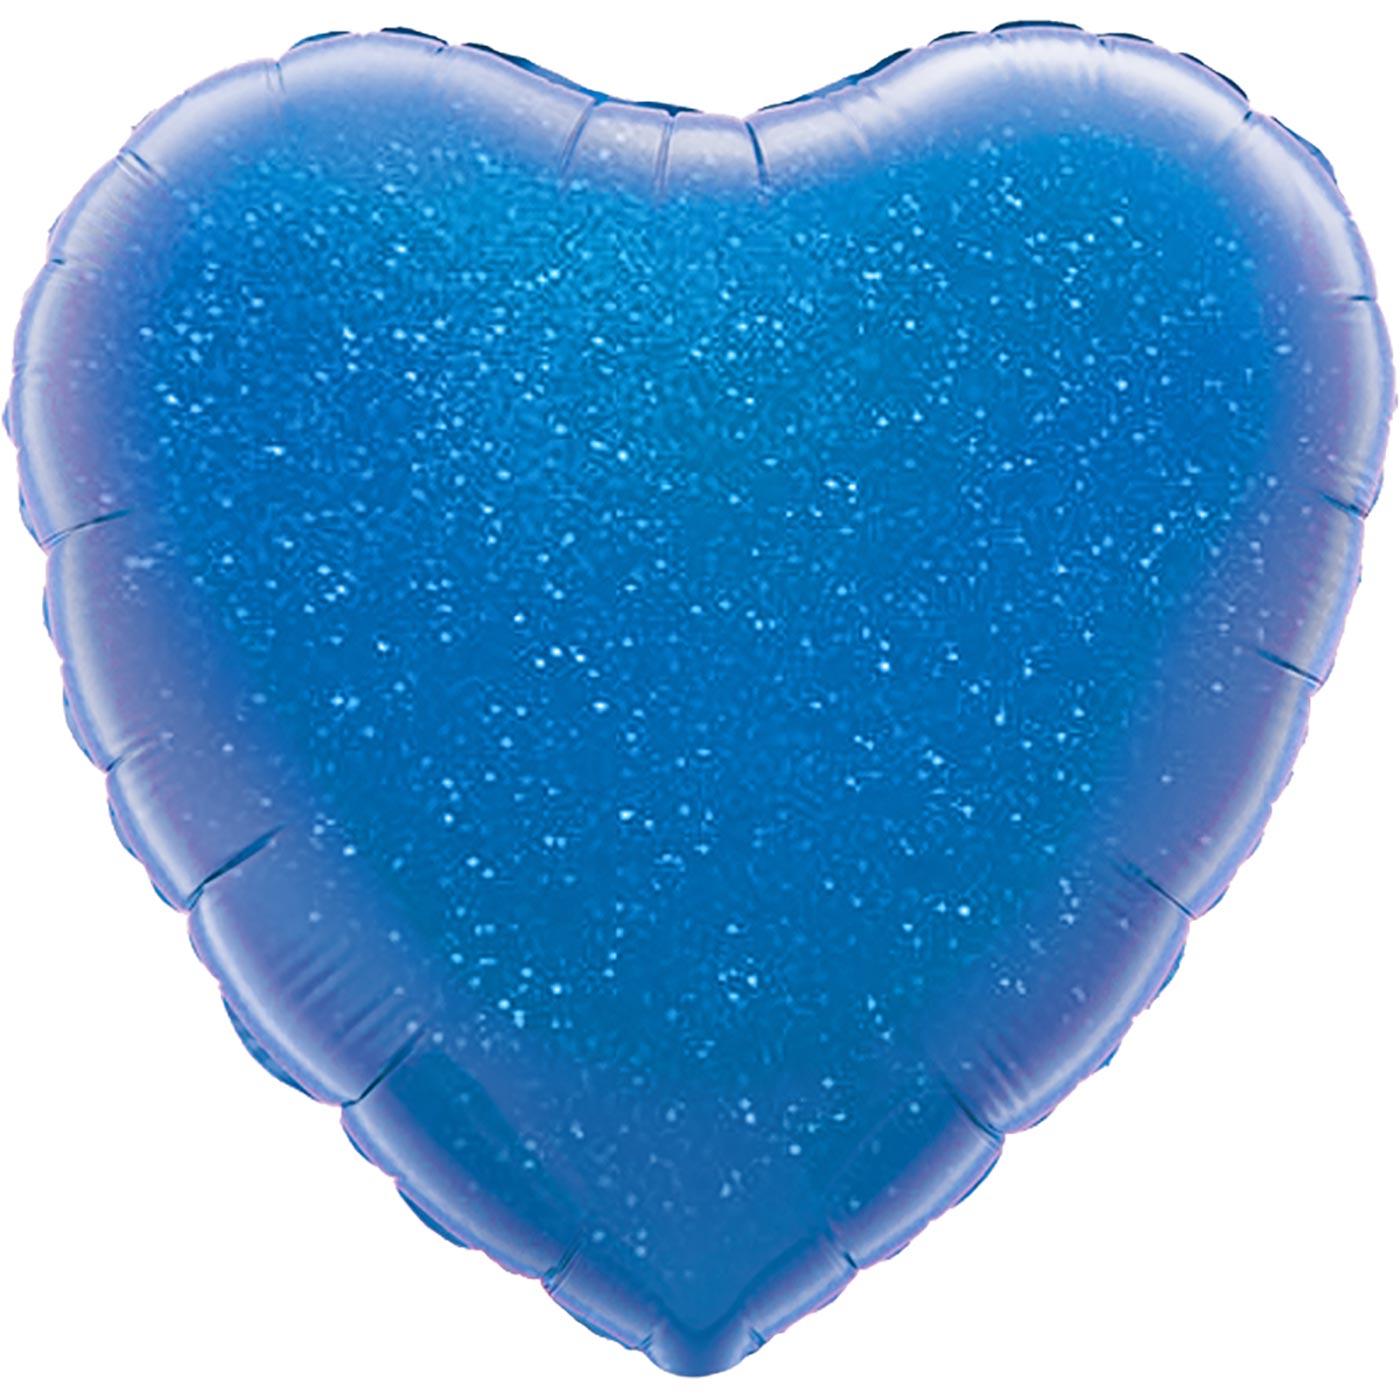 "Oaktree 18"" Blue Holographic Heart"